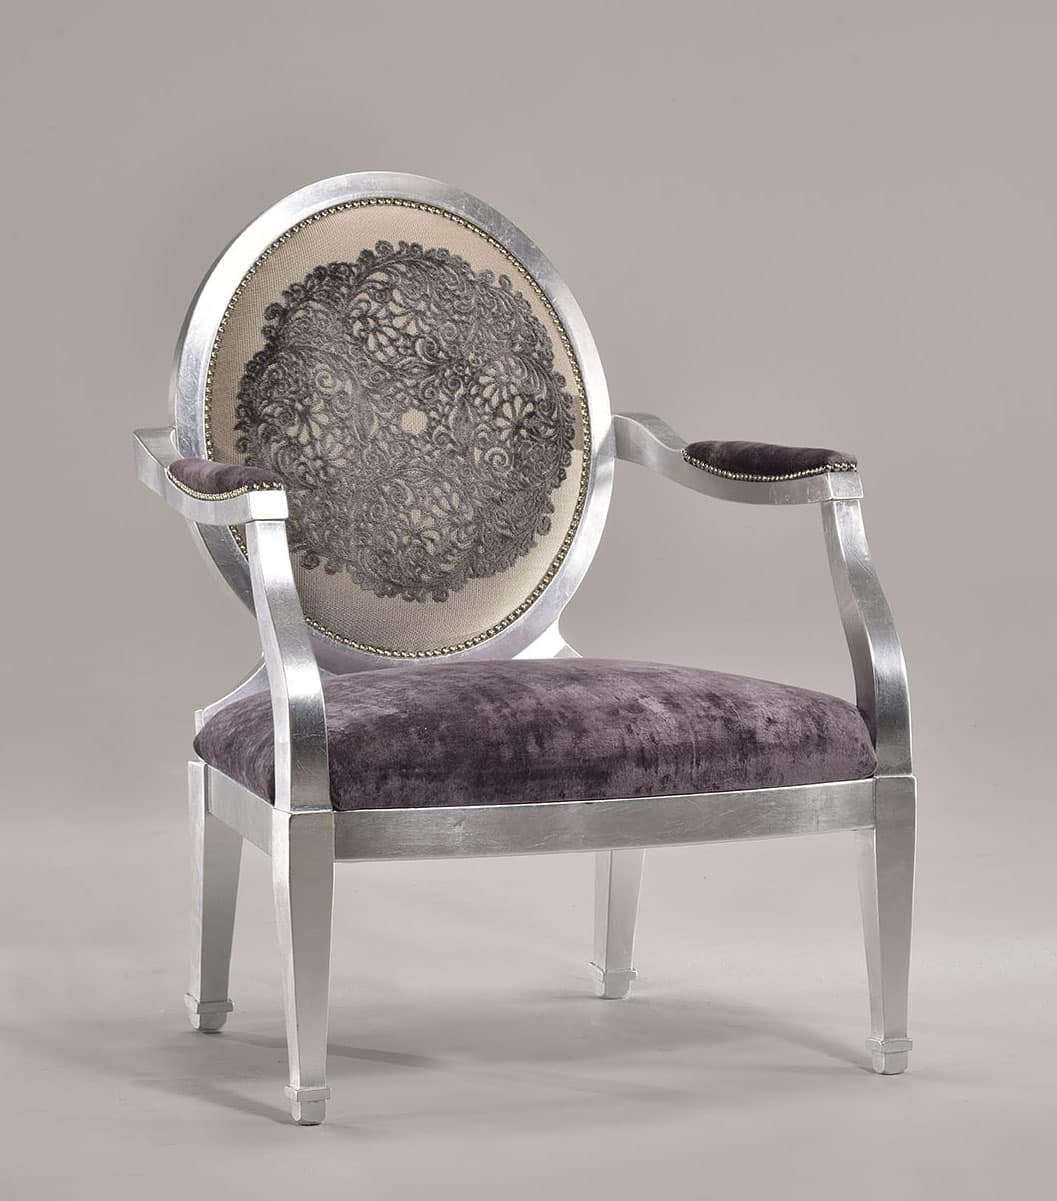 Bemerkenswert Sessel Mit Fußstütze Sammlung Von Luna Large Armchair 8239a, Gepolsterte Hocker Als